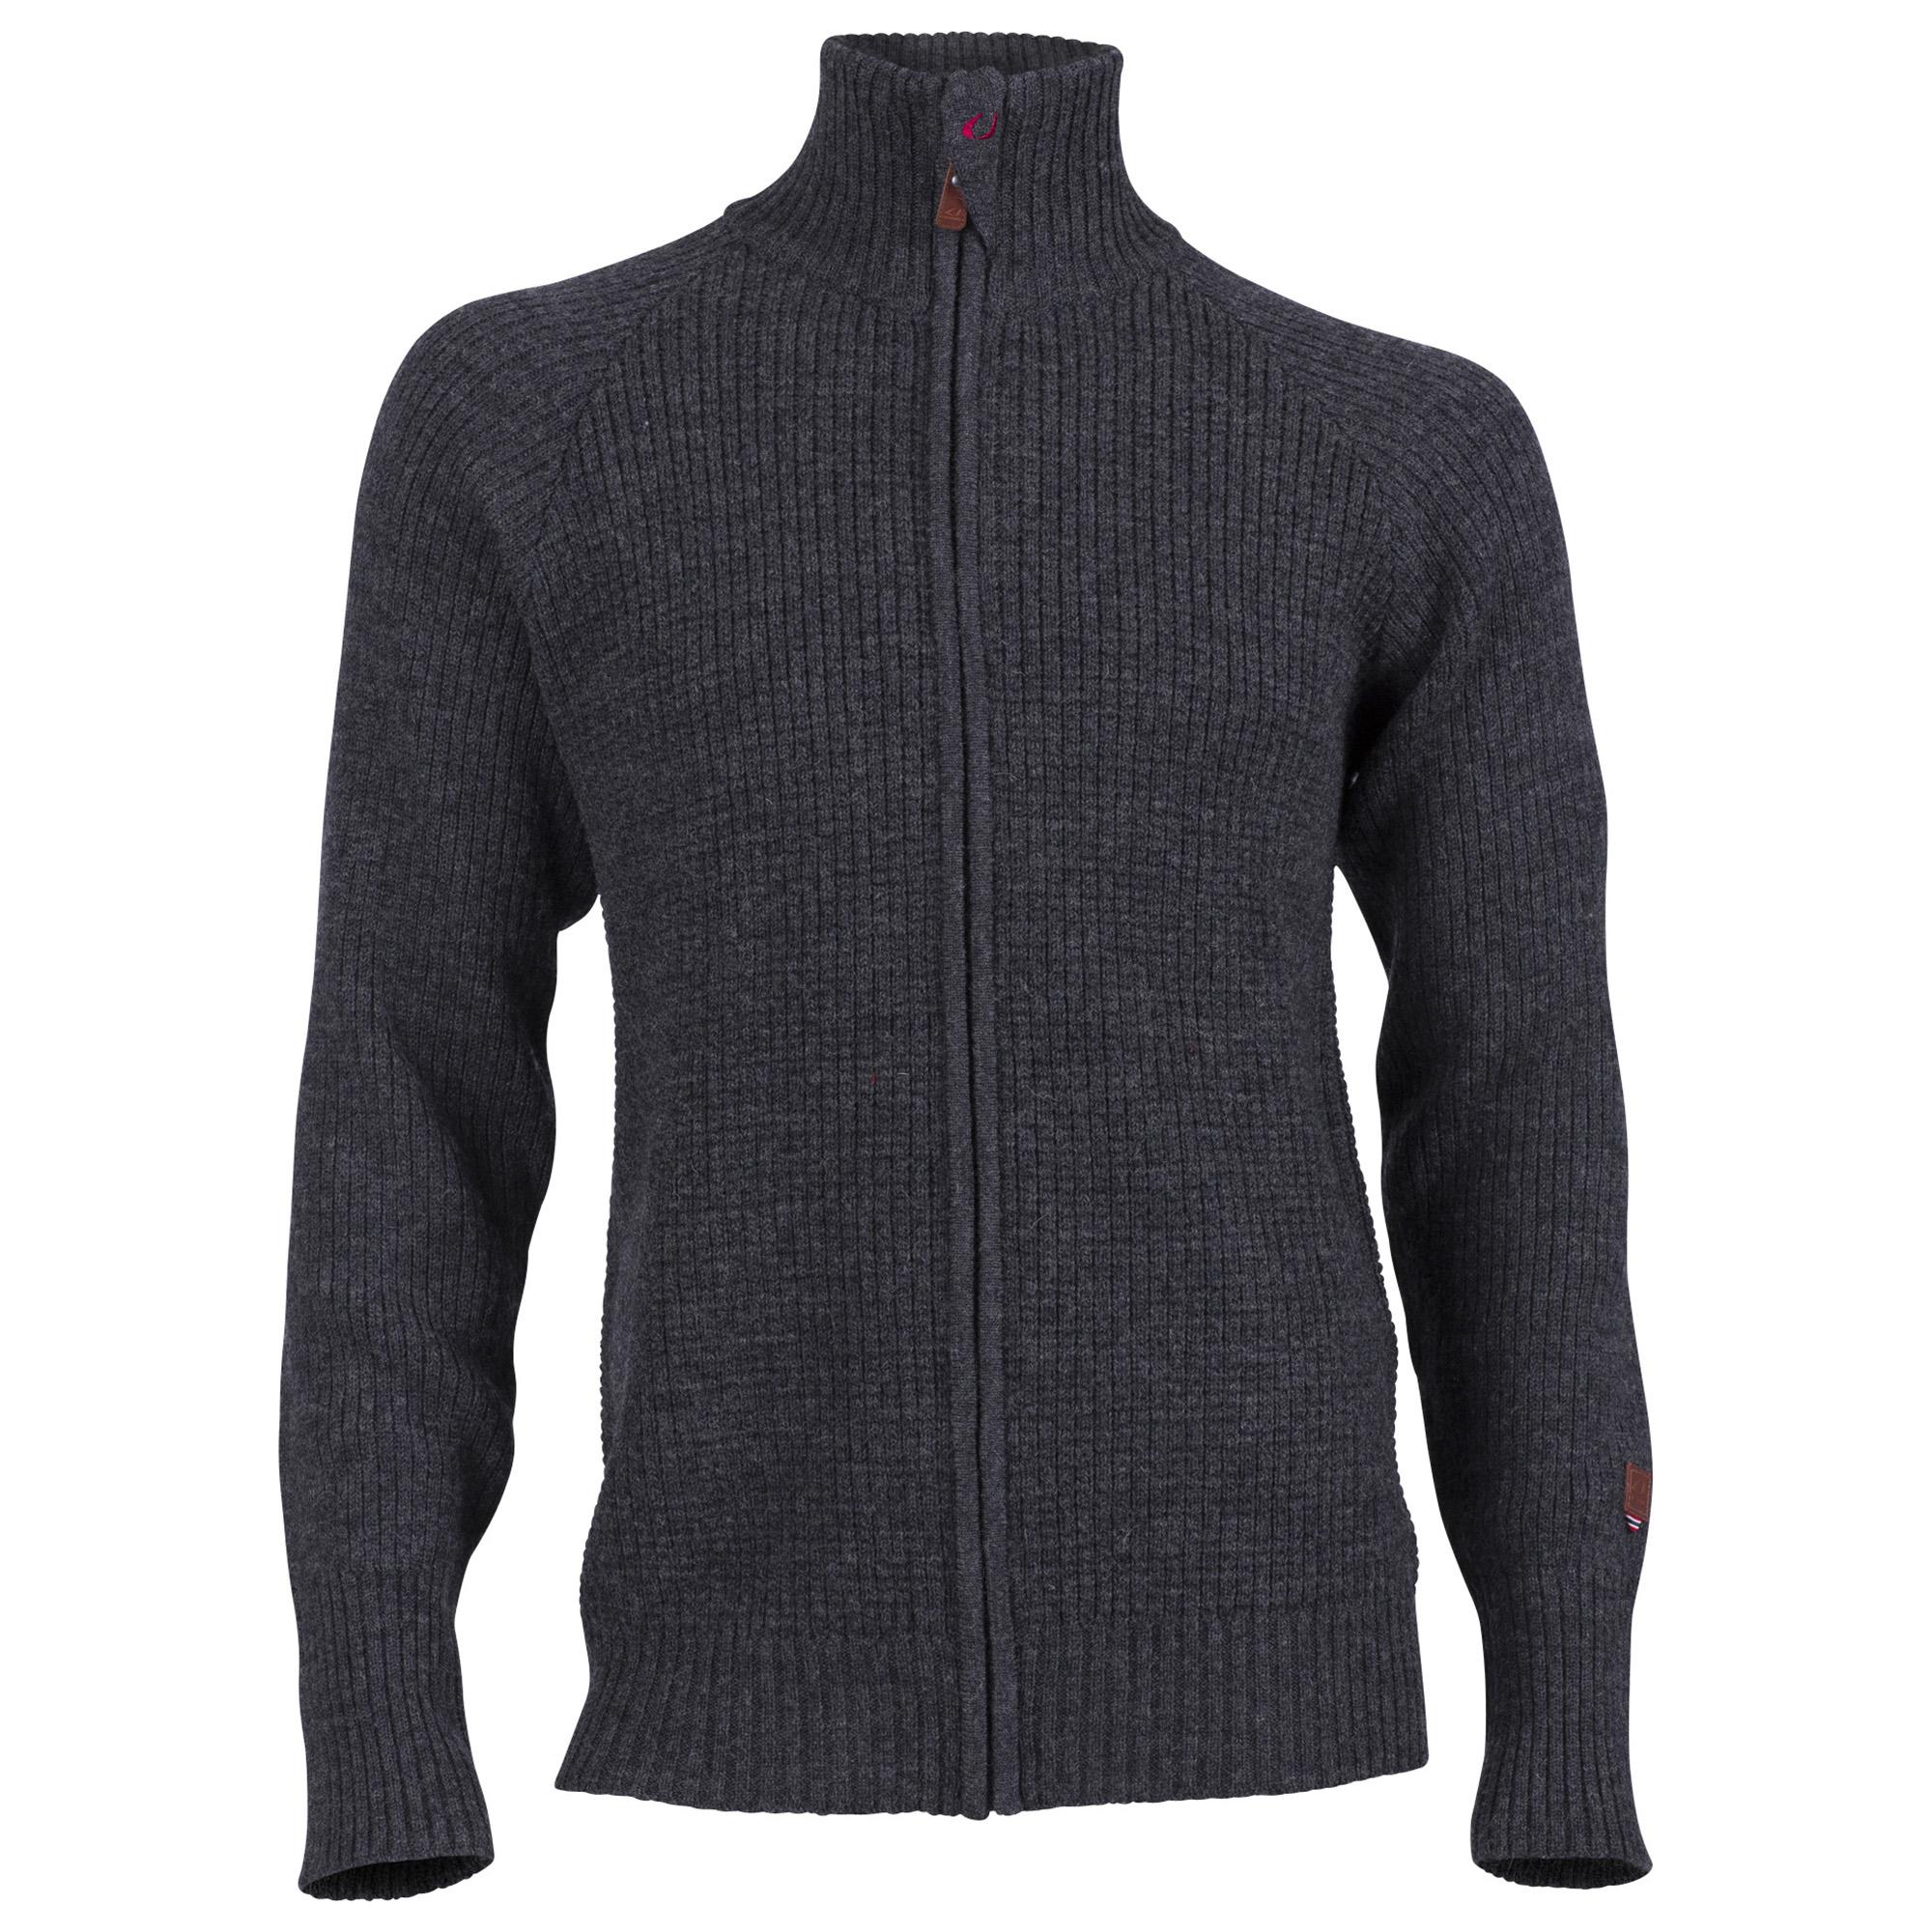 Ulvang Rav Jacket - Uldcardigan Unisex - Koksgrå | Jackets